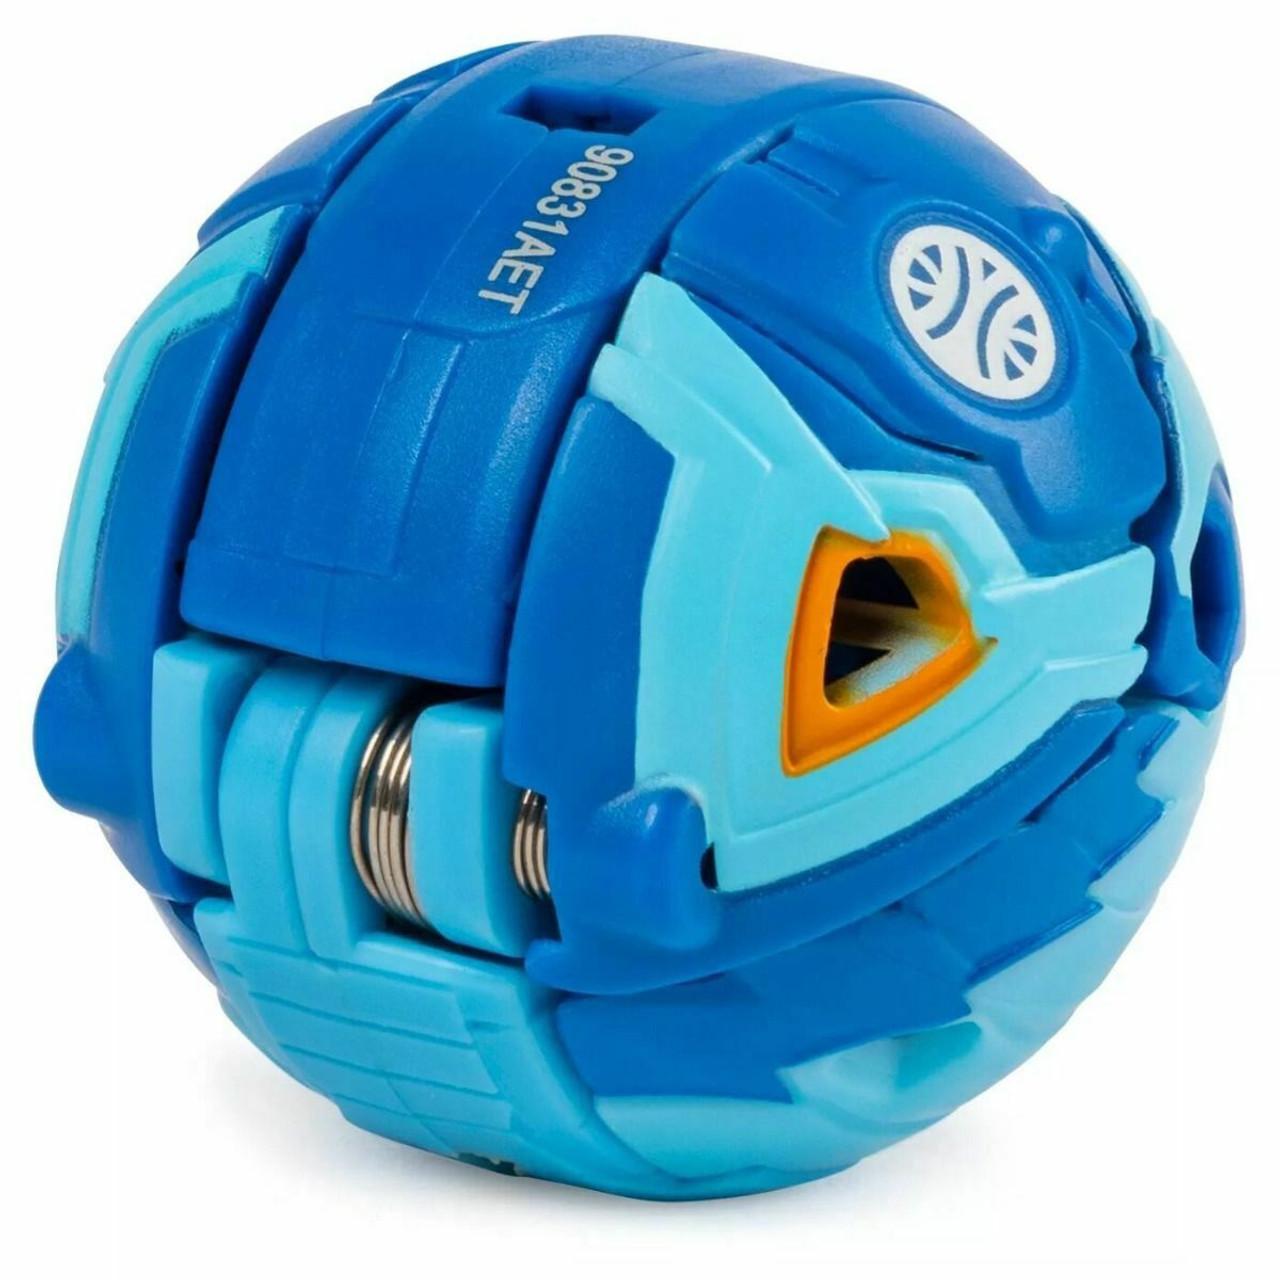 BAKUGAN AA DX GEAR BAKU BALL 38B HYDOROUS BLUE